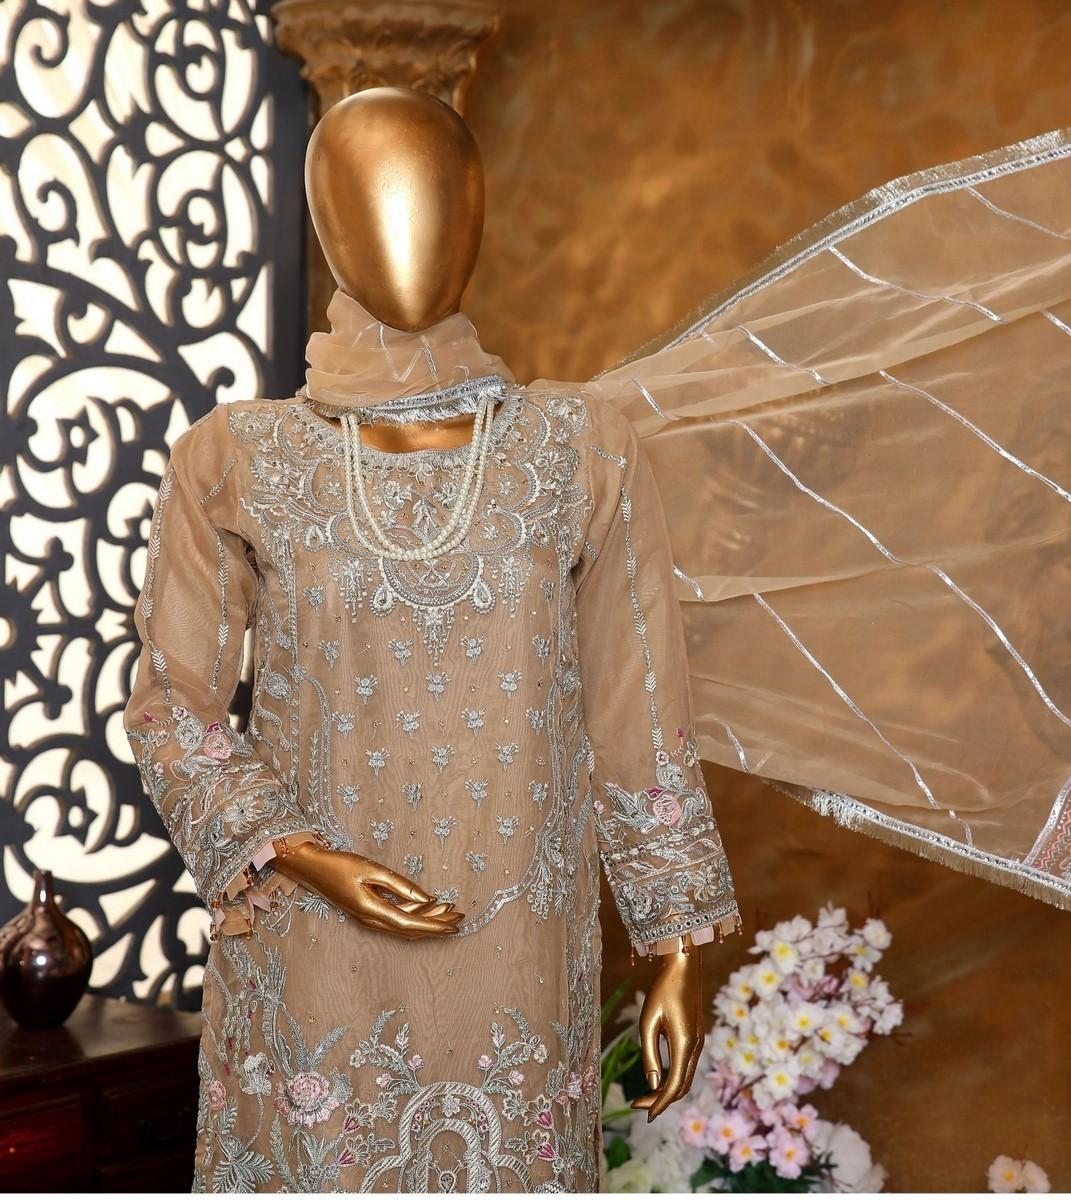 /2021/07/sadabahar-festive-formal-collection-2021-vol-1-d-n9-fawn-image3.jpeg